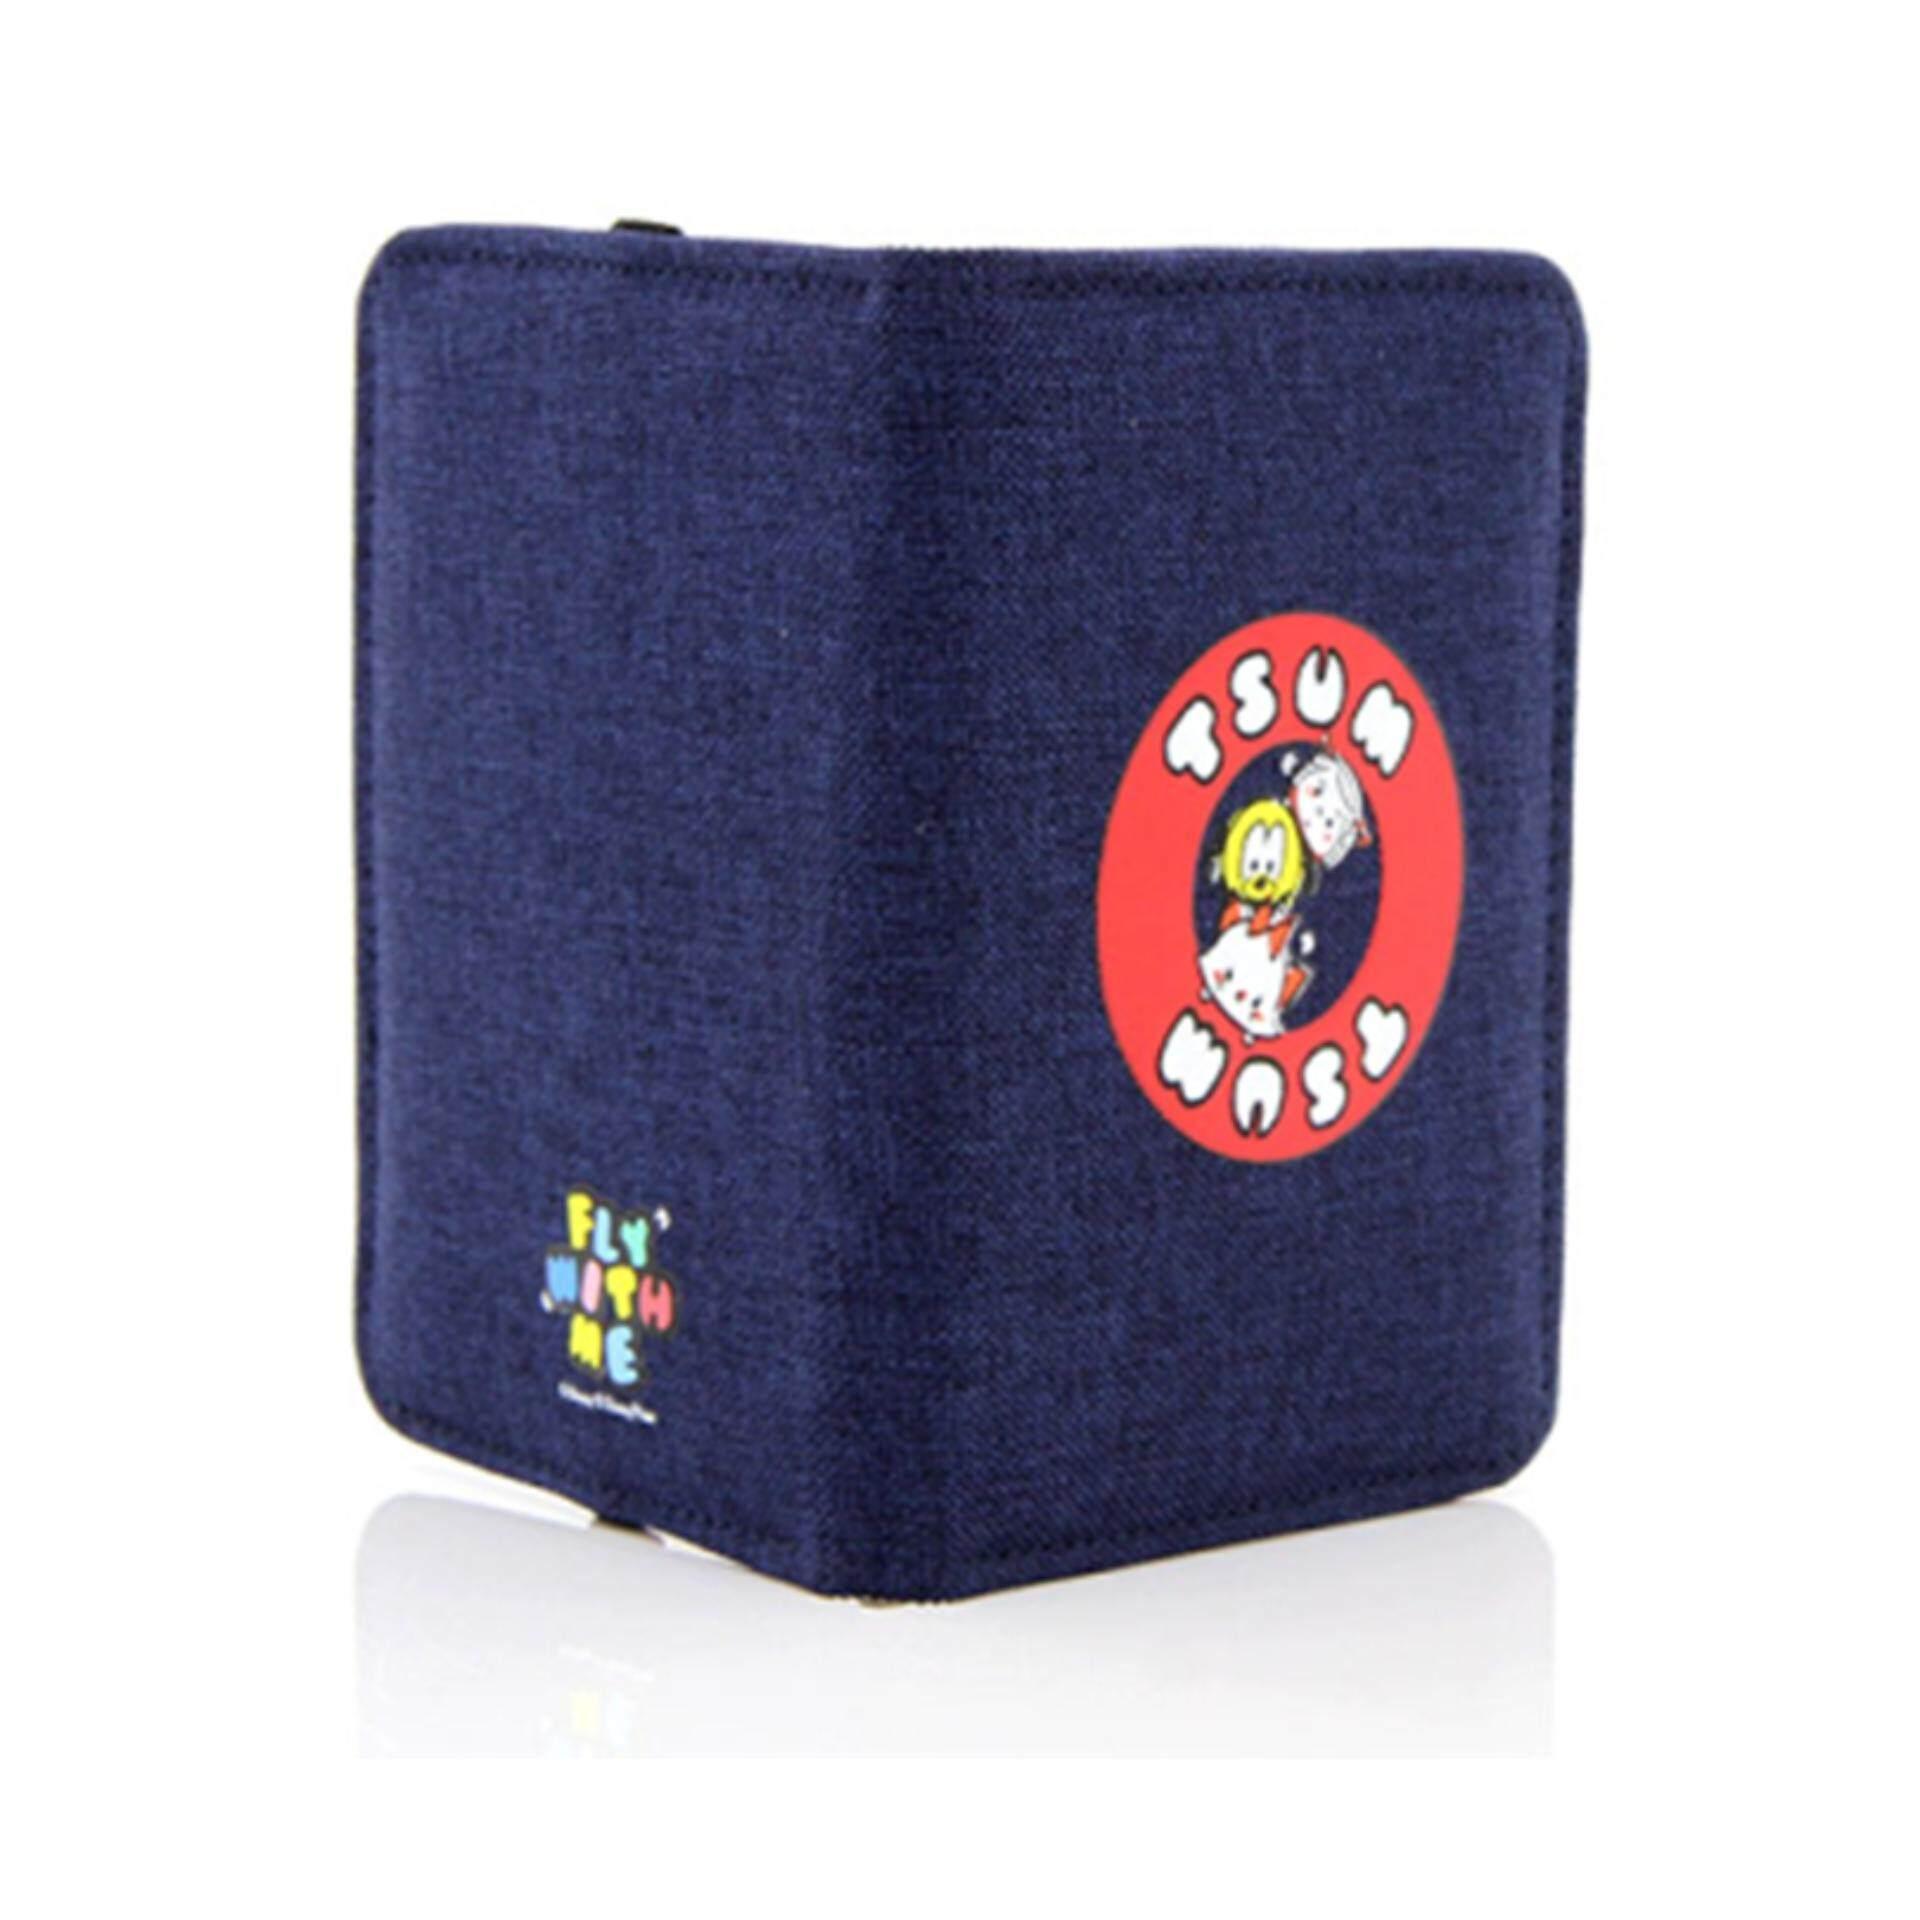 Disney Tsum Tsum Nautical Passport Holder - Dark Blue Colour